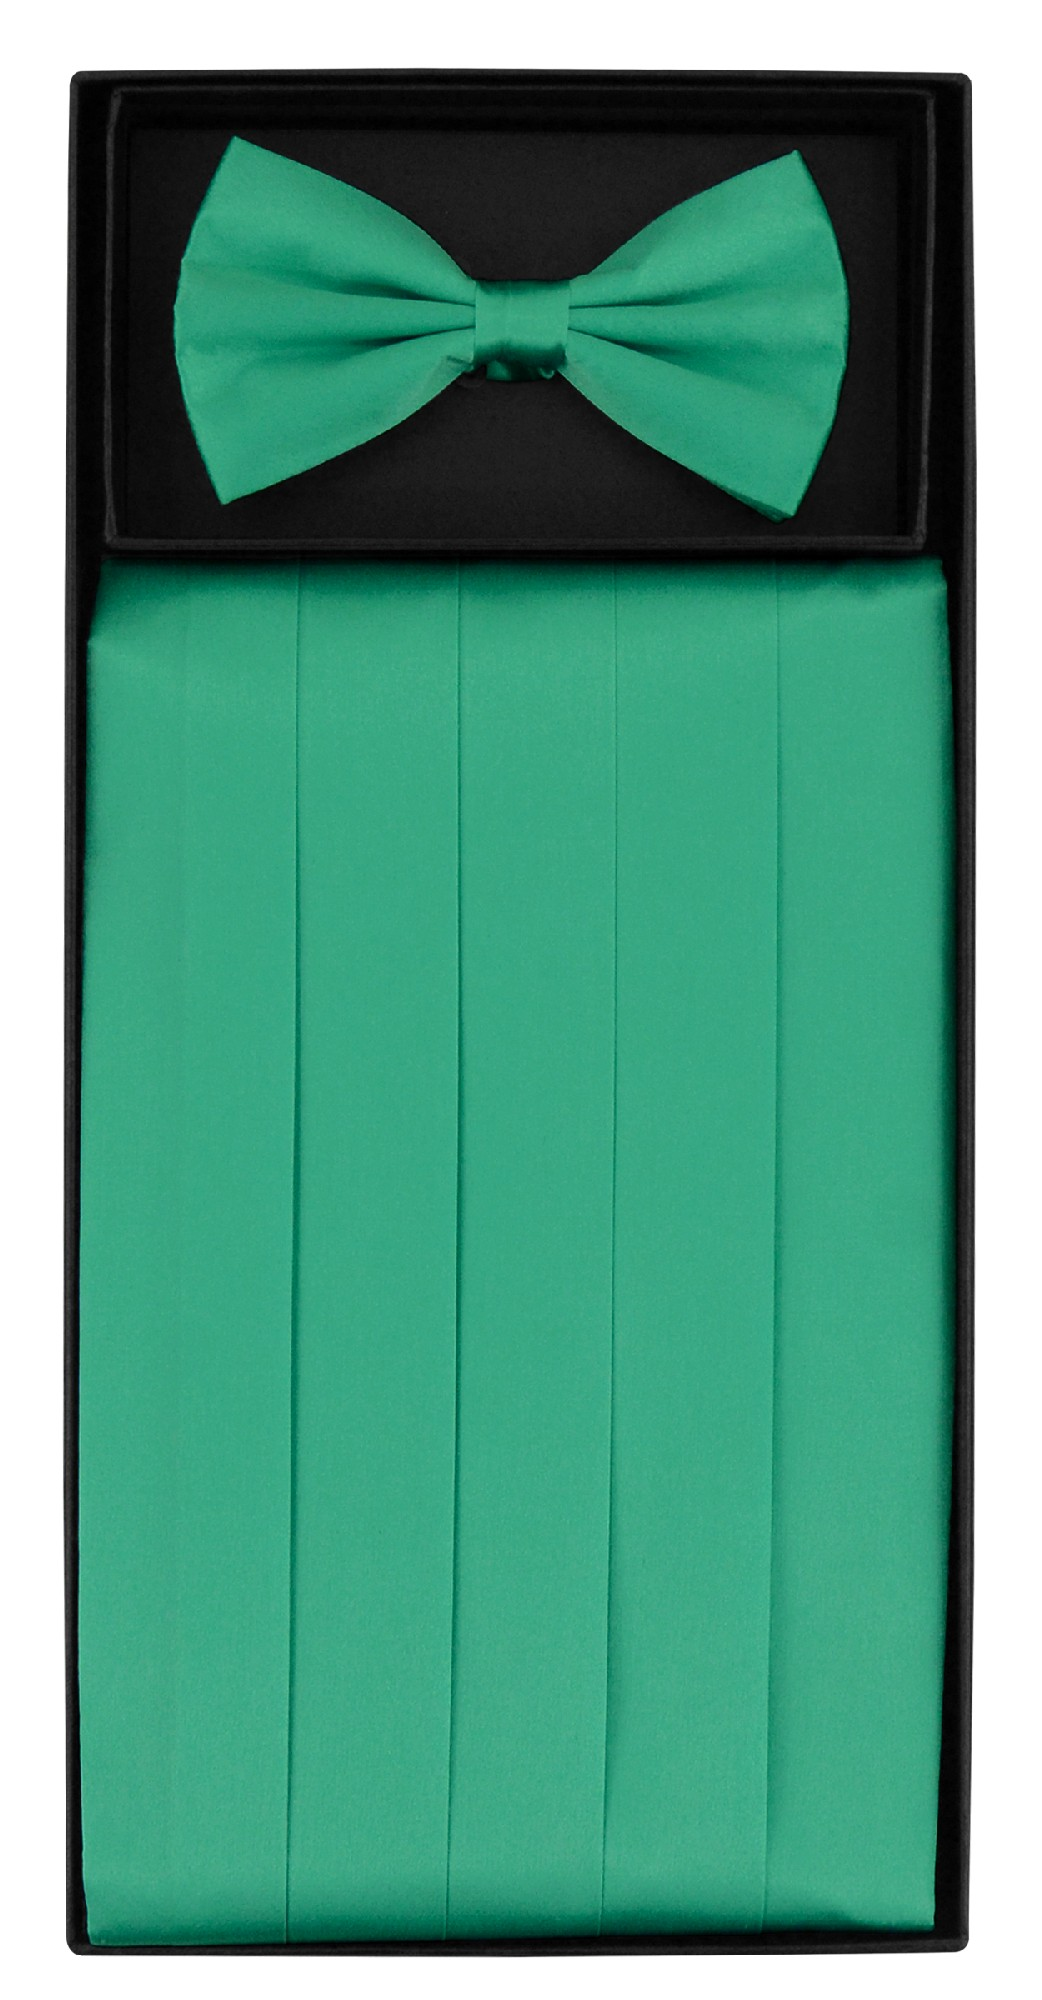 SILK Cumberbund & BowTie Solid AQUA GREEN Color Men's Cummerbund Bow Tie Set